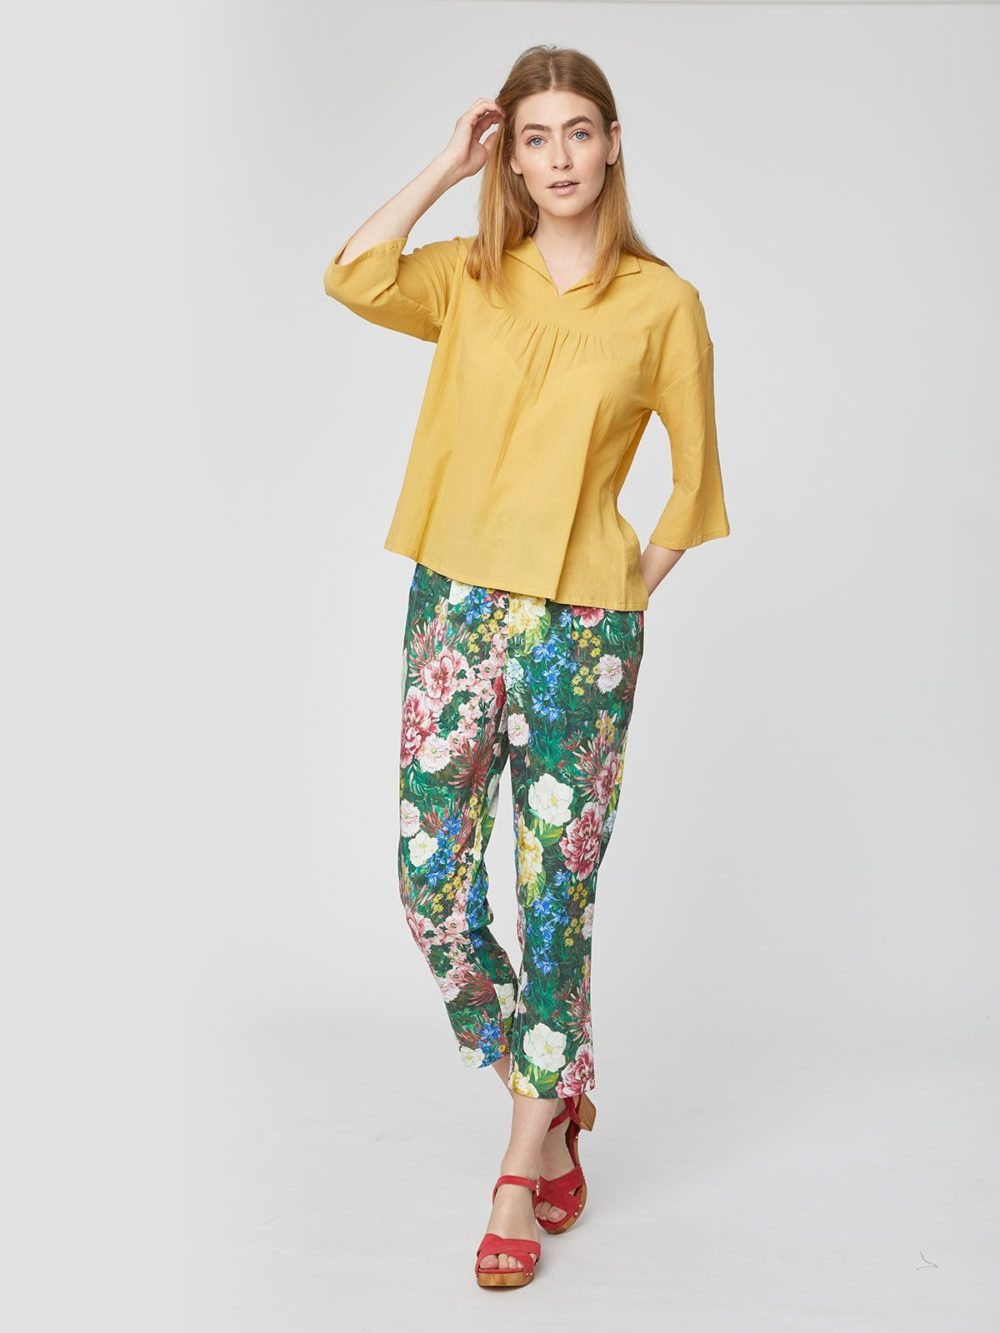 WSB4172 Leolani Trousers Thought Clothing Katie Kerr Women's Clothing